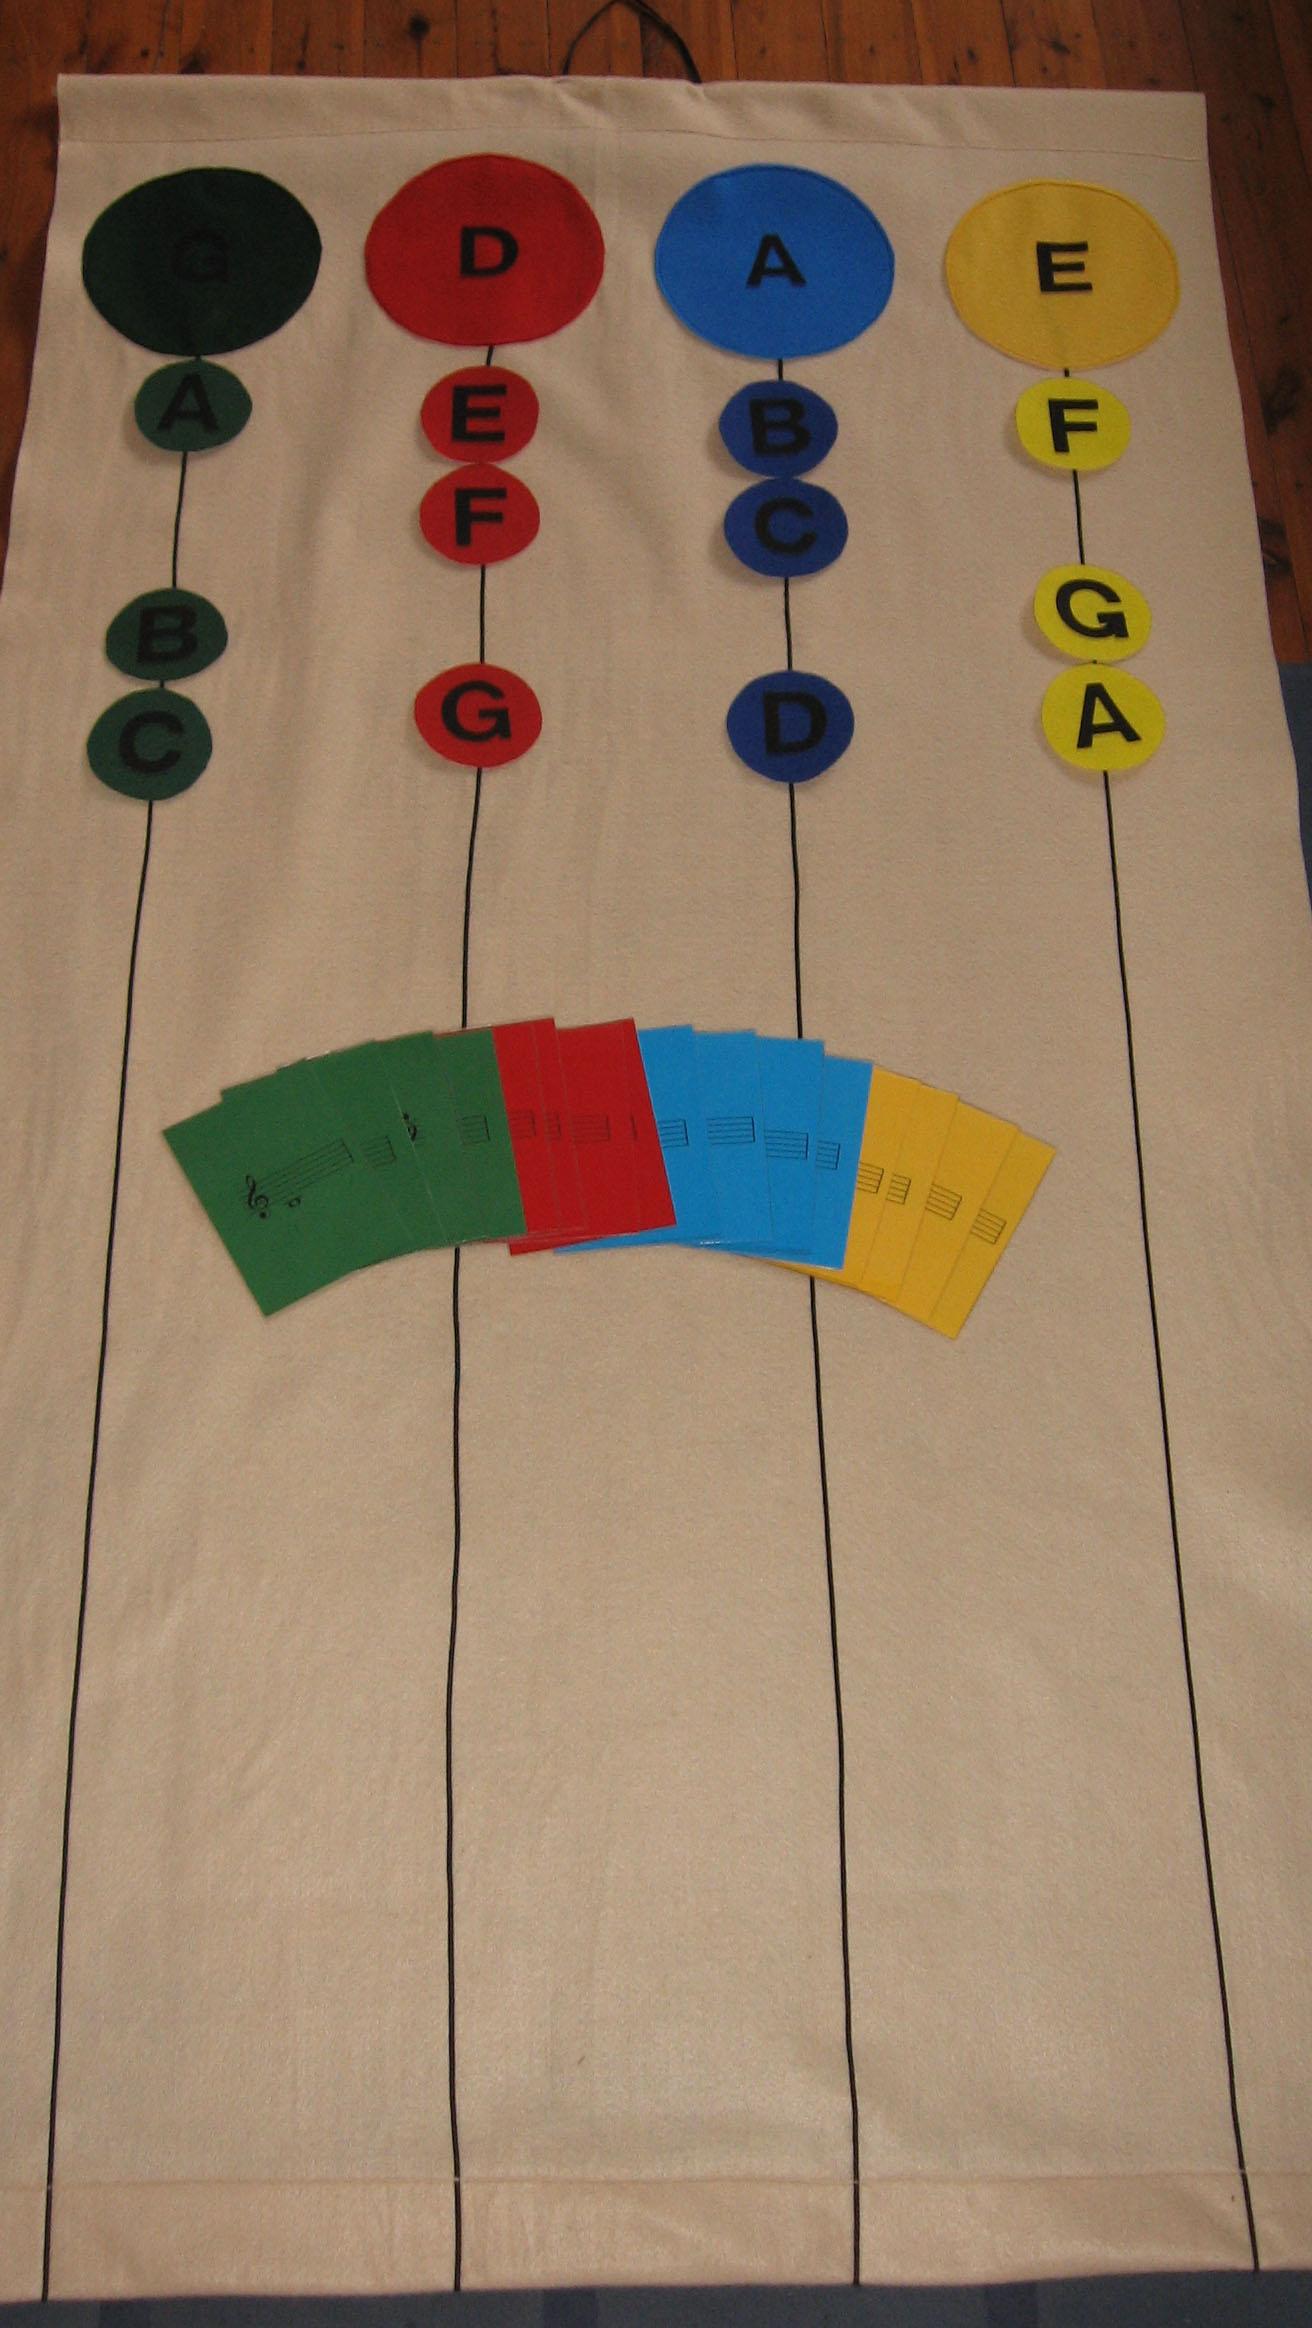 GDAE String Game